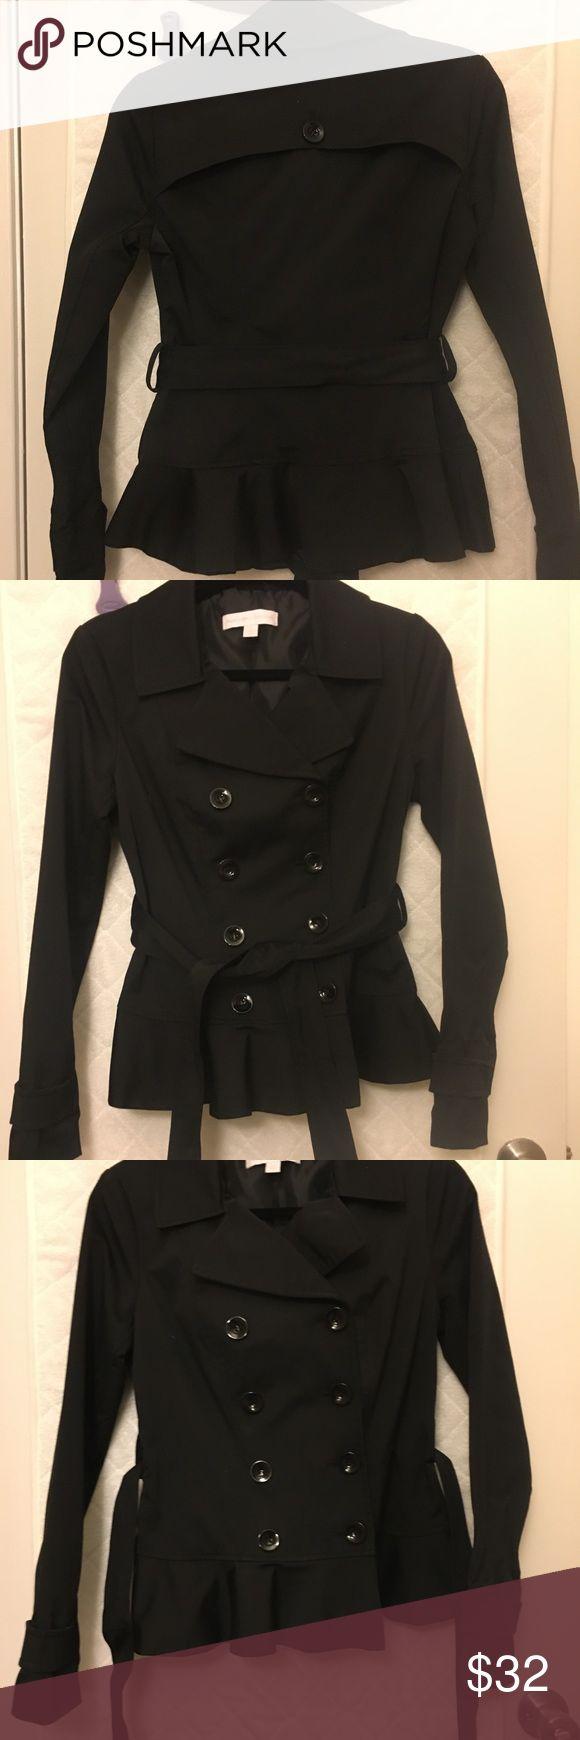 Black pea coat XS black pea coat in excellent condition. Worn twice. New York & Company Jackets & Coats Pea Coats